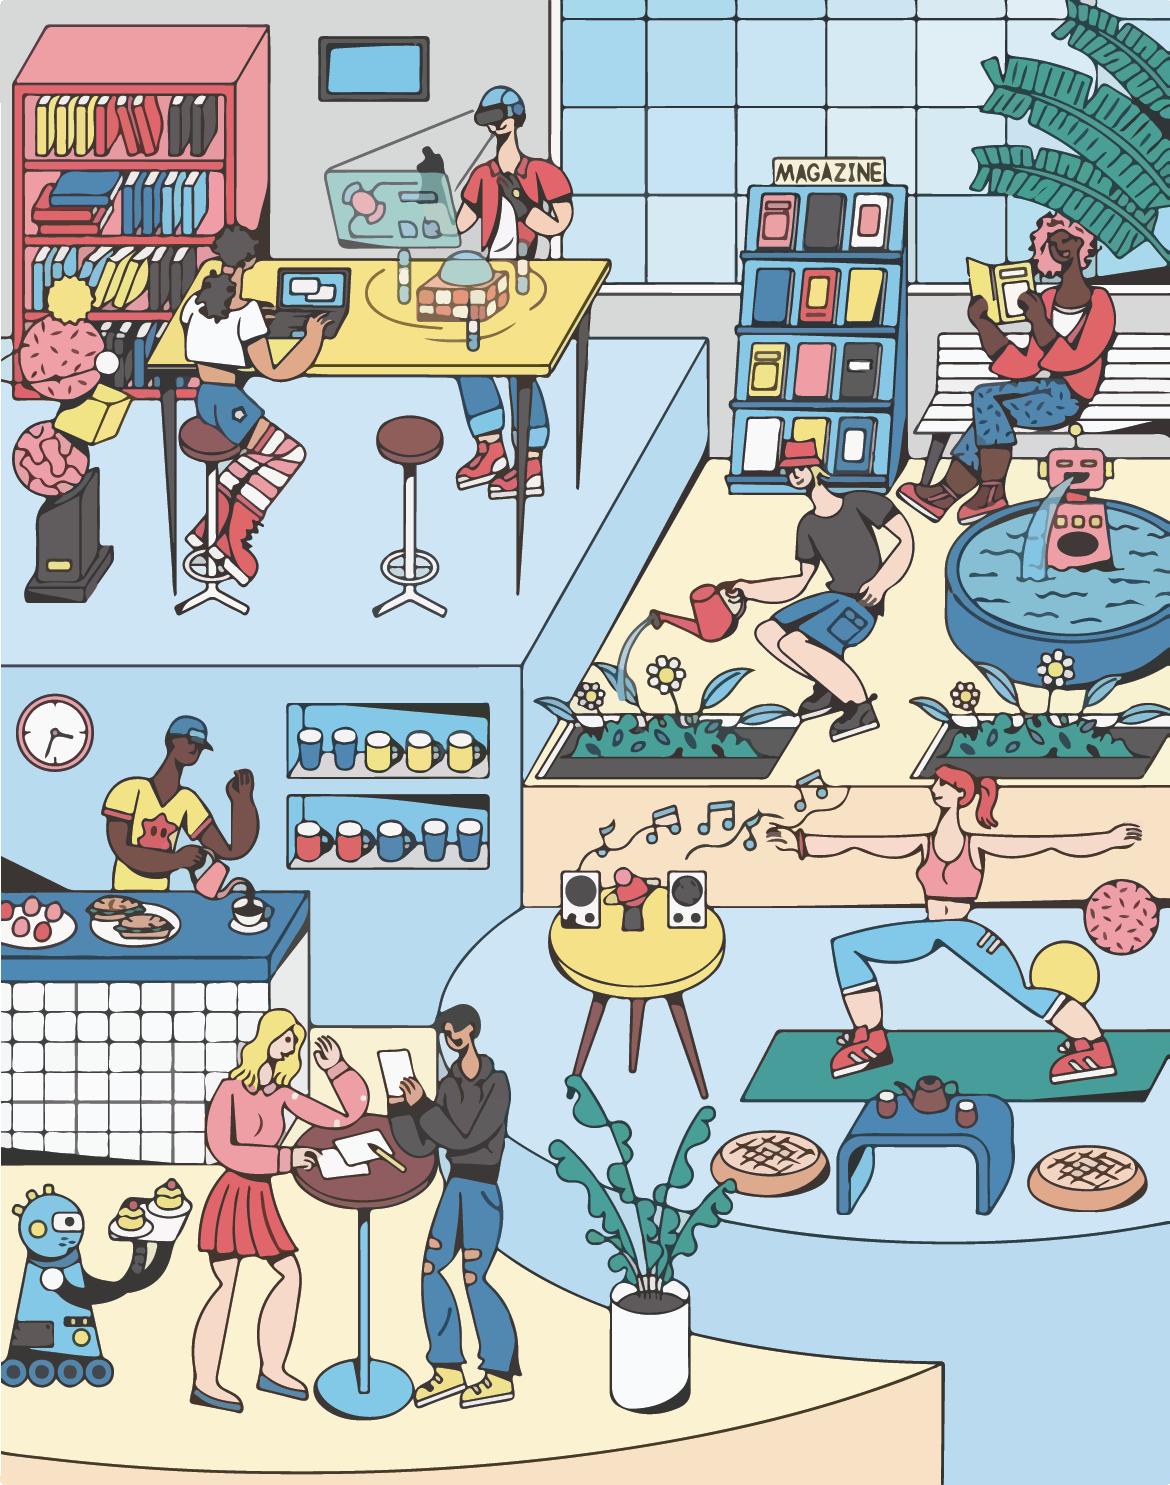 Future of the office full illustration